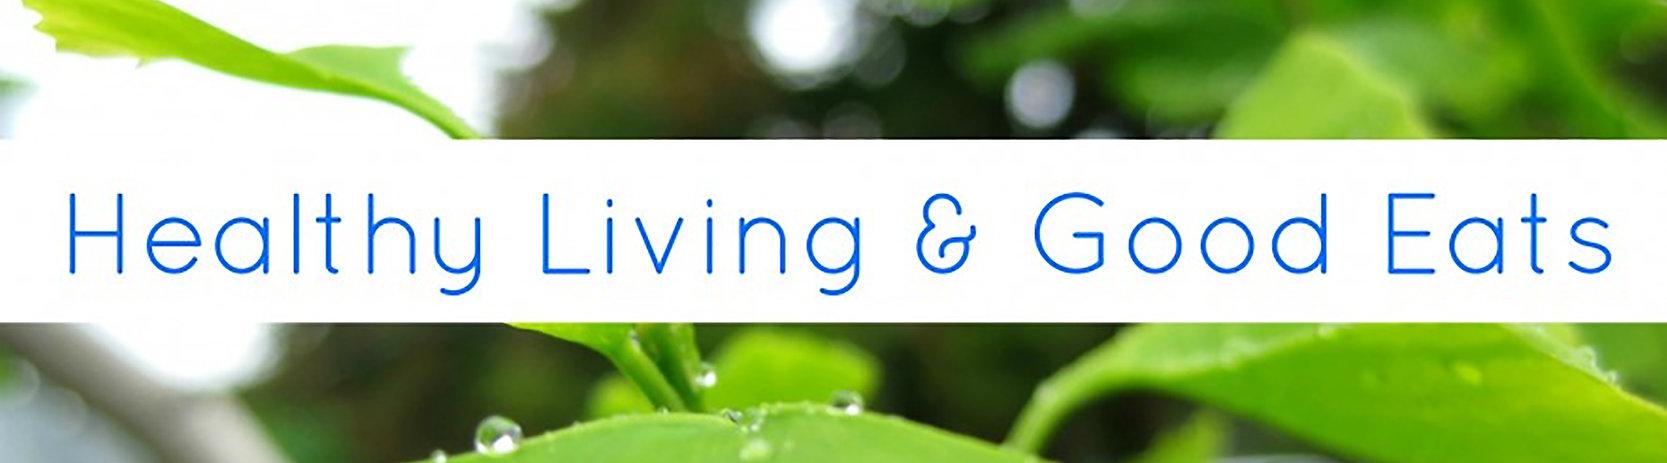 healthy living banner 1.jpg